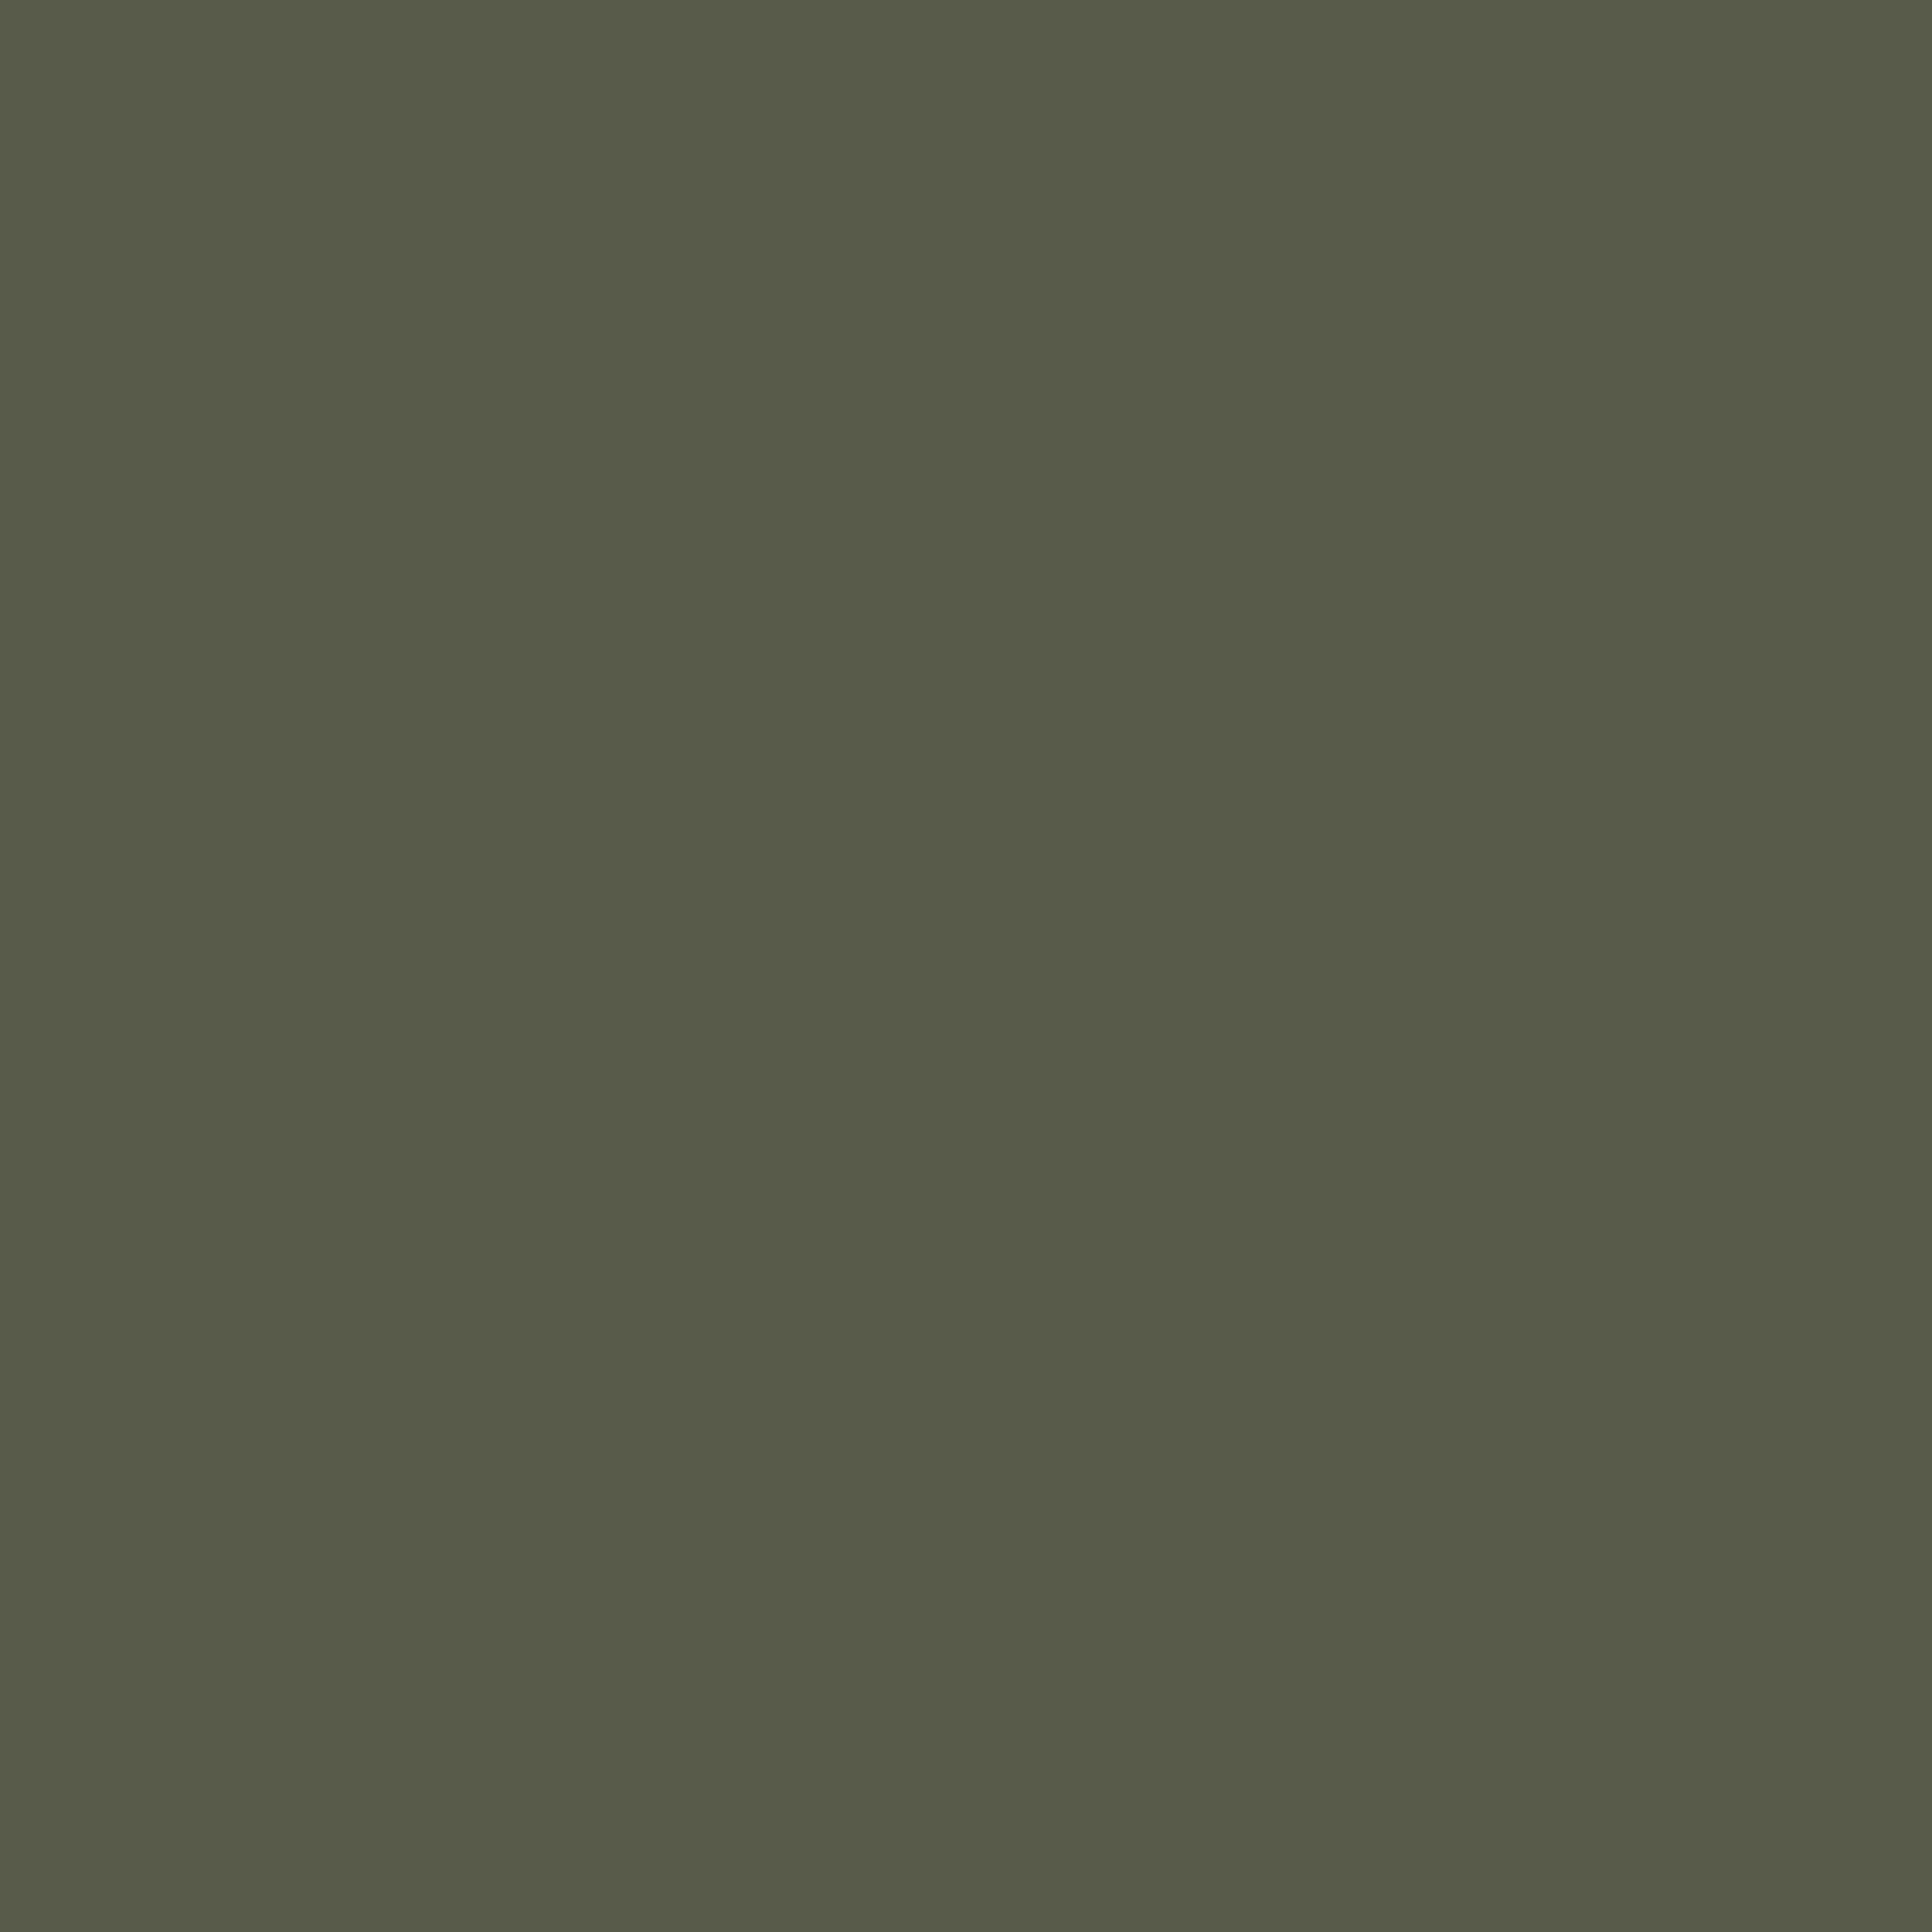 Dark olive green